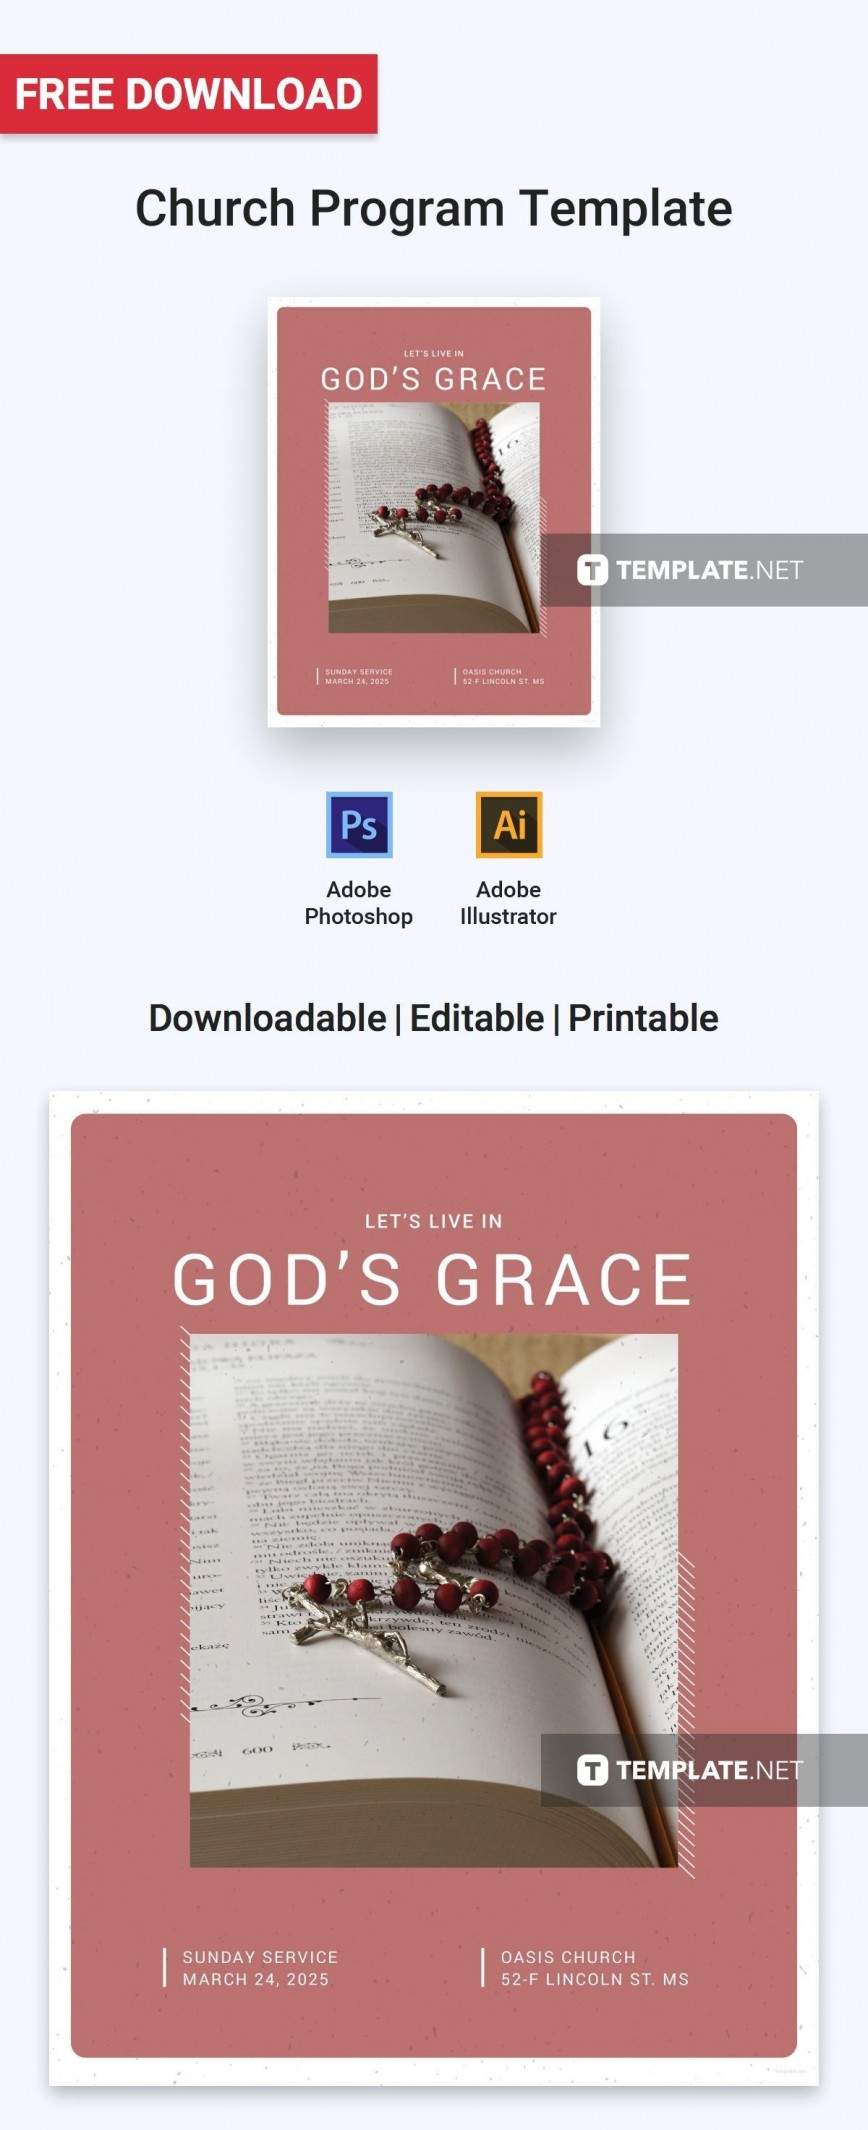 002 Unbelievable Free Church Program Template High Definition  Printable Anniversary Blank